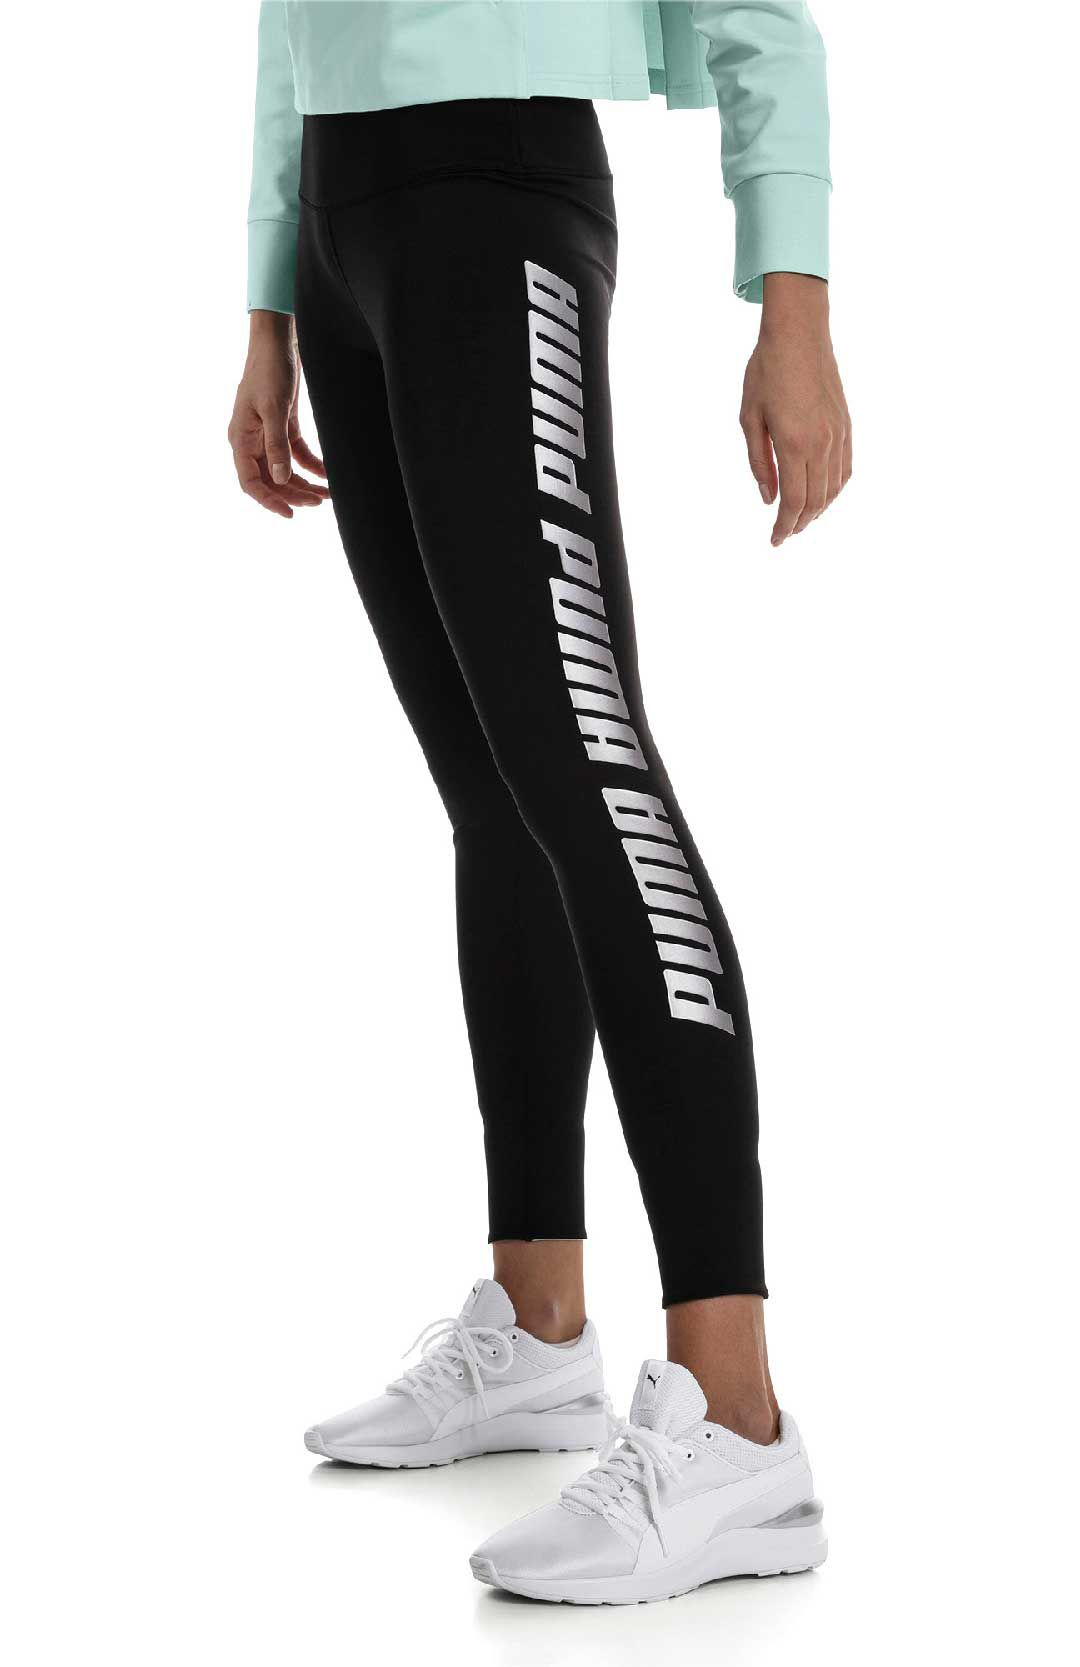 615354264217a PUMA Women's Modern Sports Fold-Up Legging | DICK'S Sporting Goods